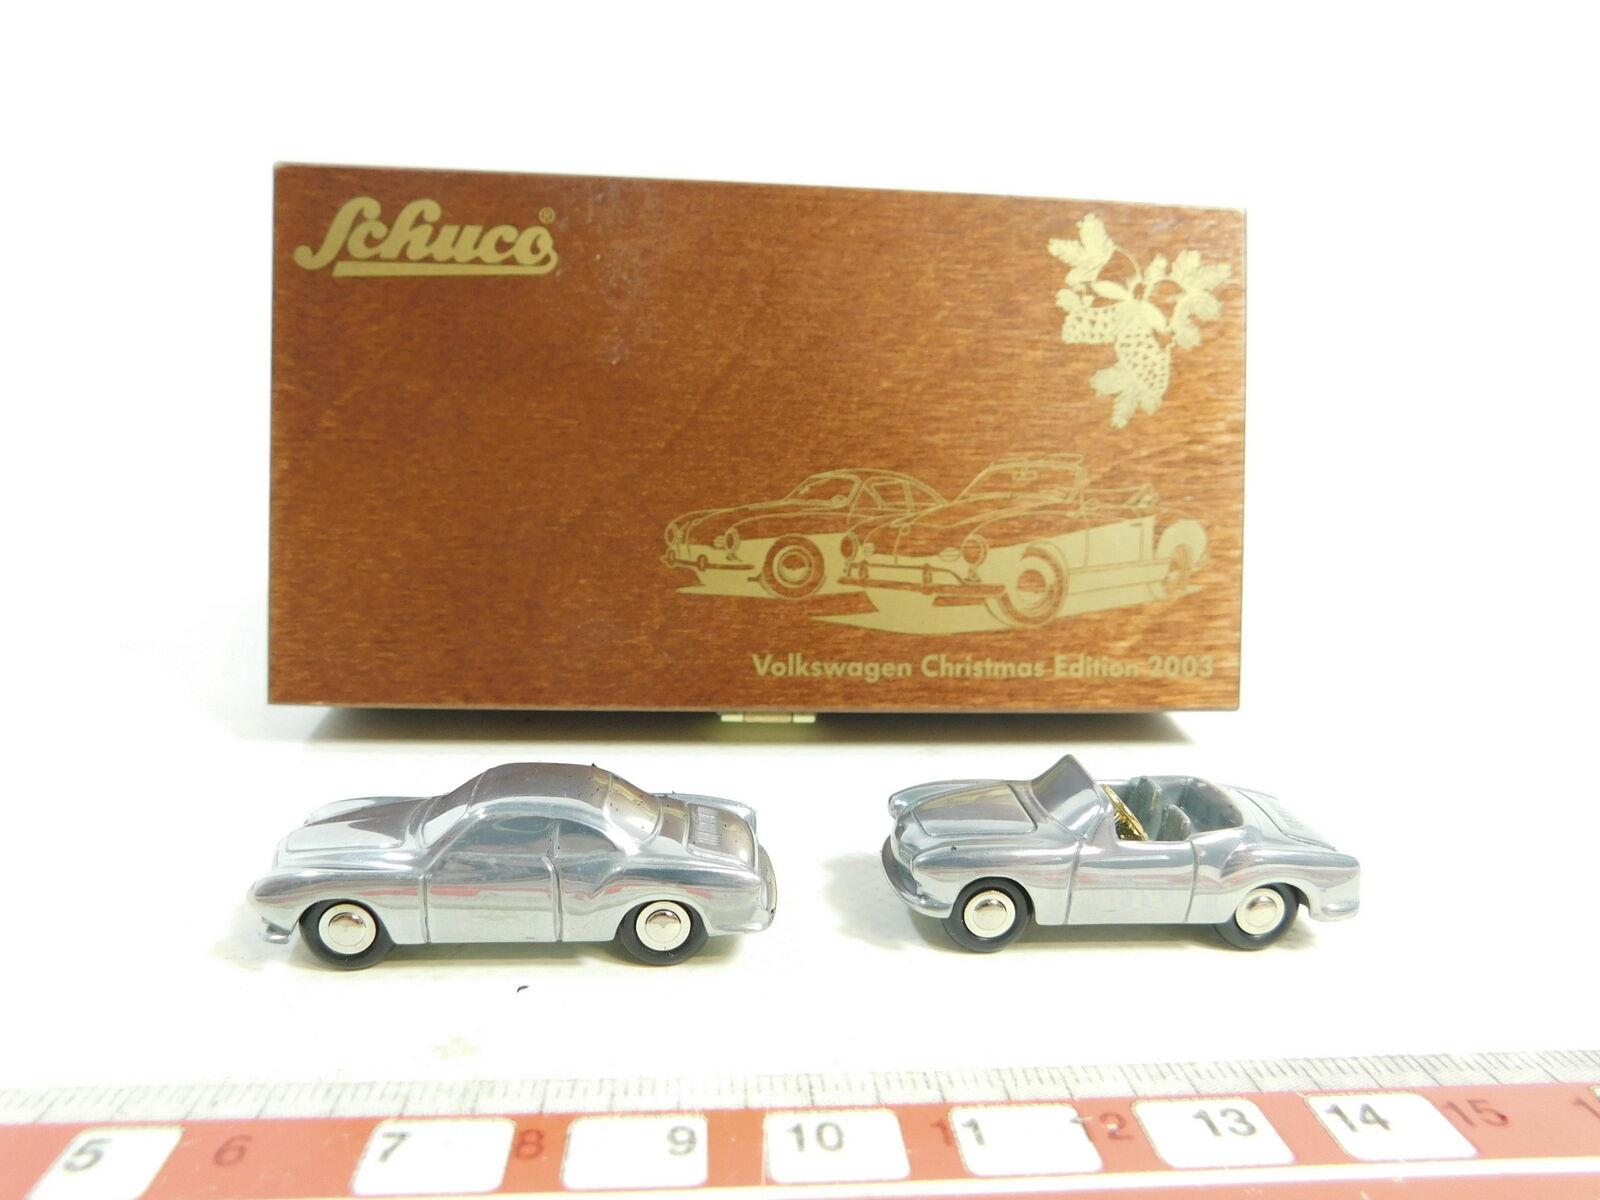 BD262-0,5  Schuco 1 90 0968 Set Volkswagen VW Christmas Edition 2003, s.g.+OVP